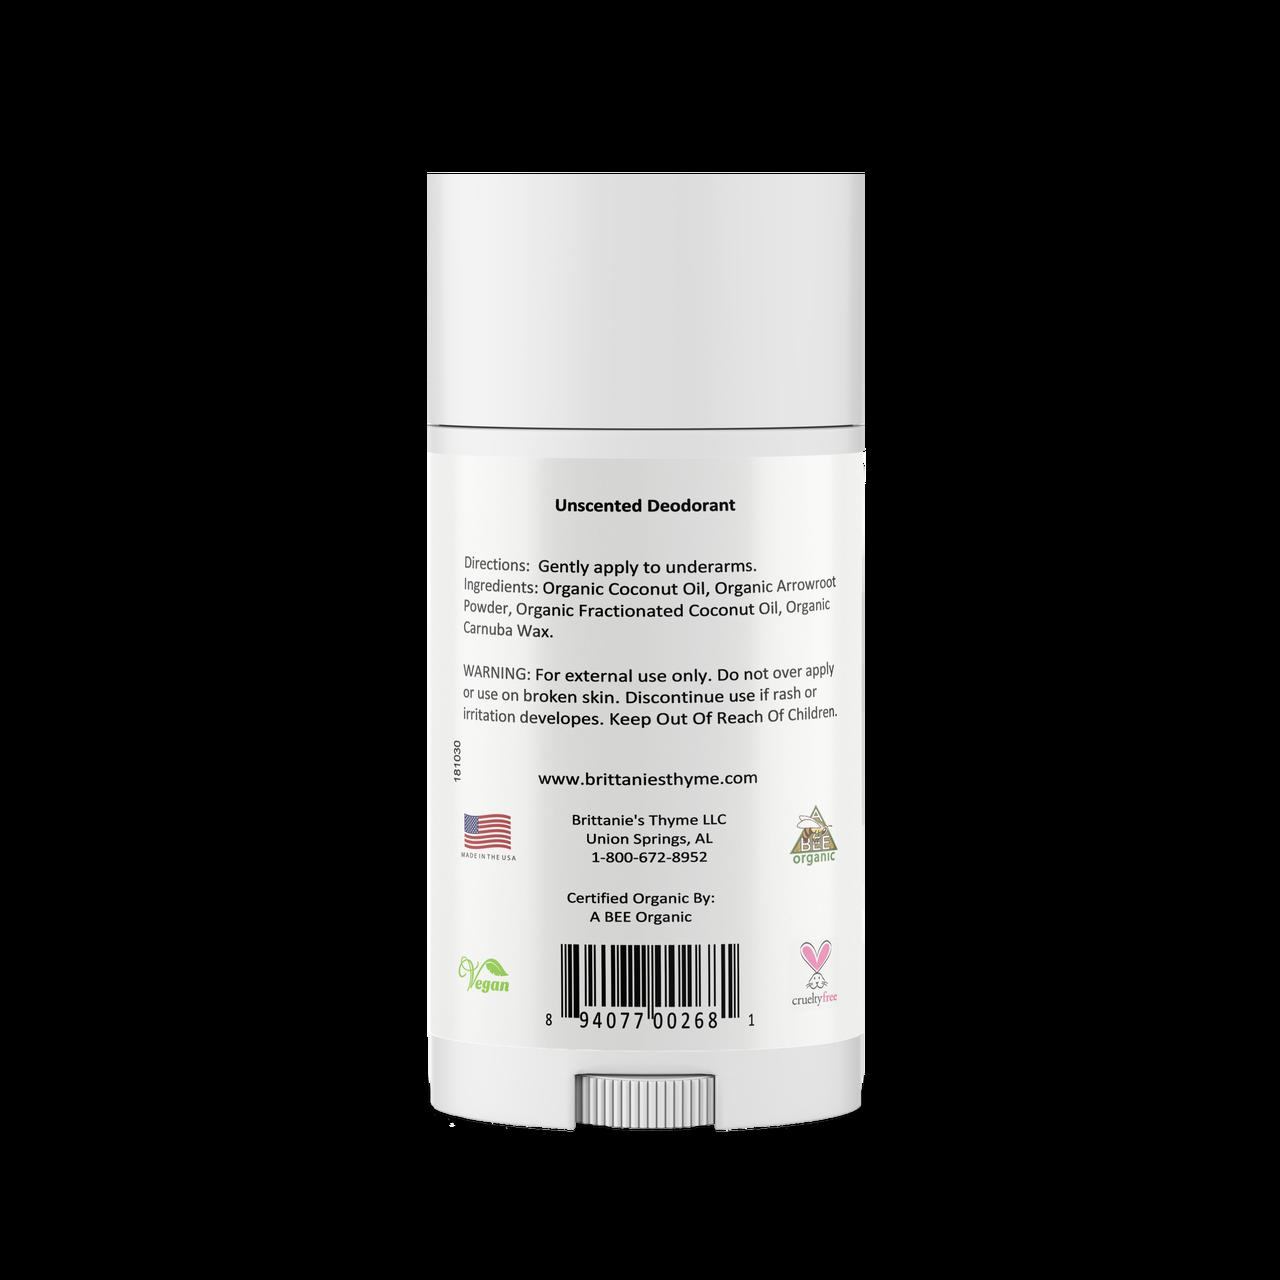 Ingredients: Organic Coconut Oil, Organic Arrowroot Powder, Organic Shea Butter, Organic Carnauba Wax, Organic Bees Wax, Aluminum Free Sodium Bicarbonate, Organic Glycerin.